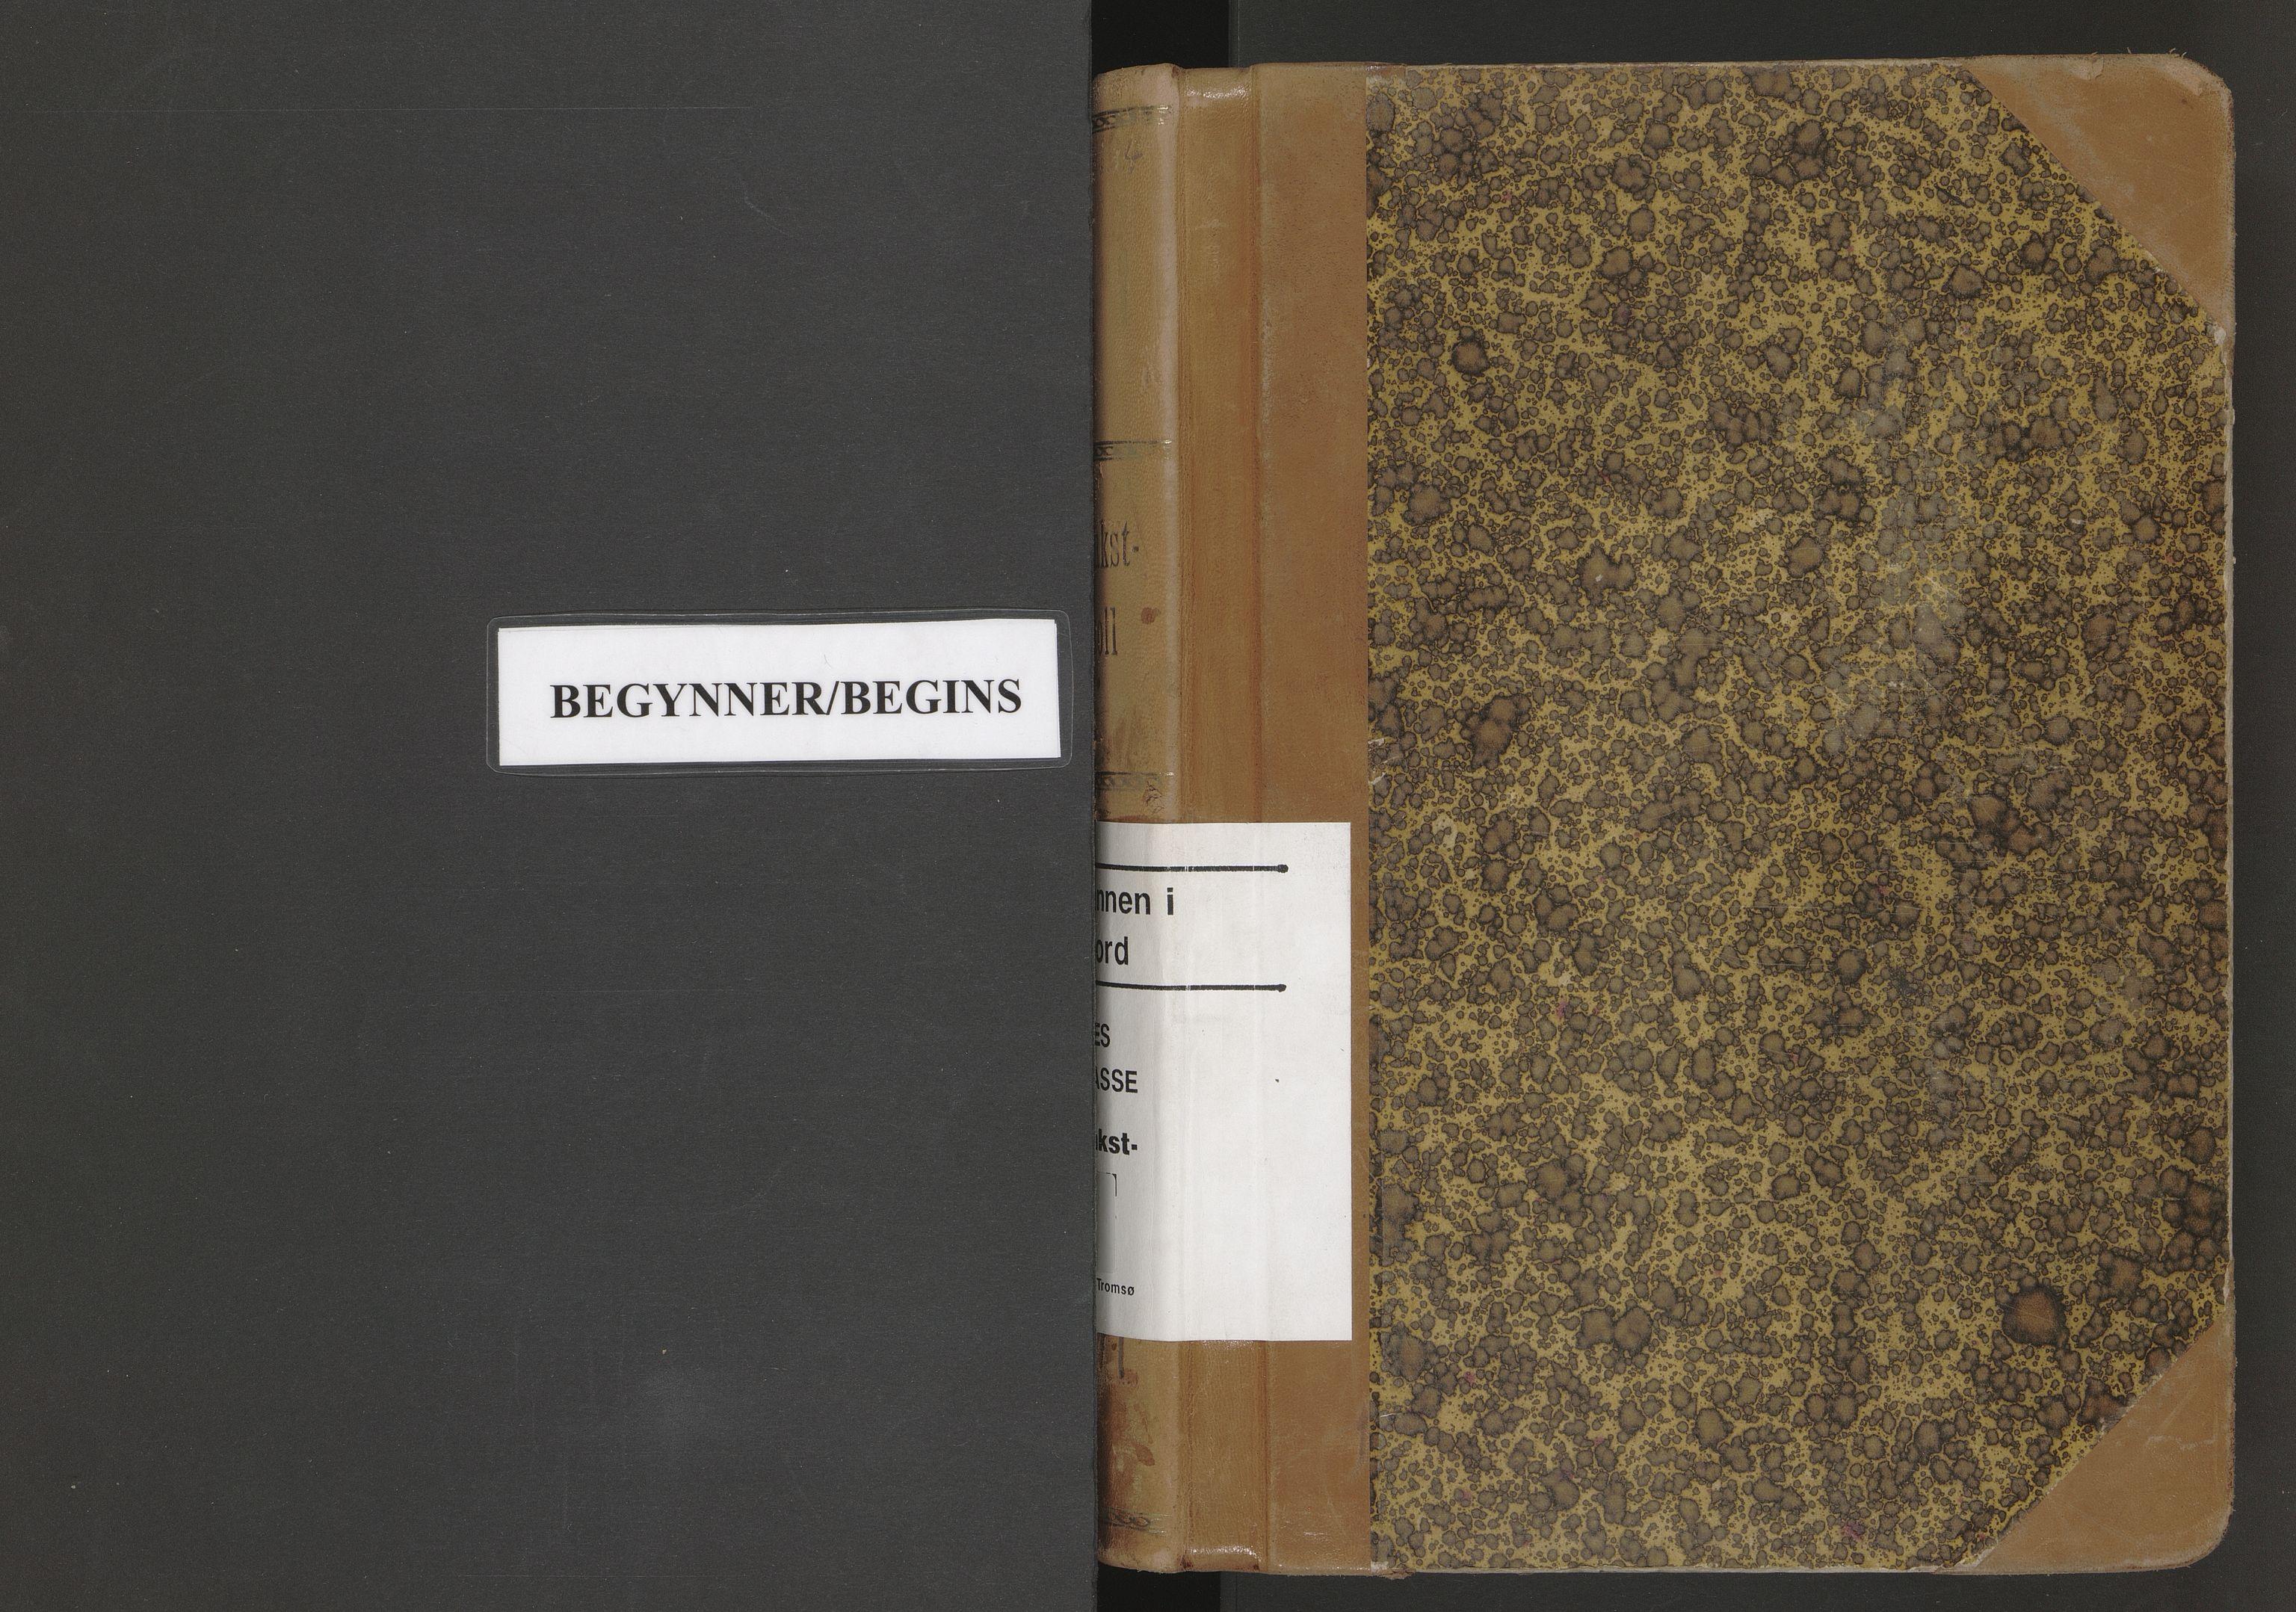 SATØ, Lensmannen i Balsfjord, Hf/Hfb/L0190: Branntakstprotokoller 1873-1977. Med register, 1934-1936